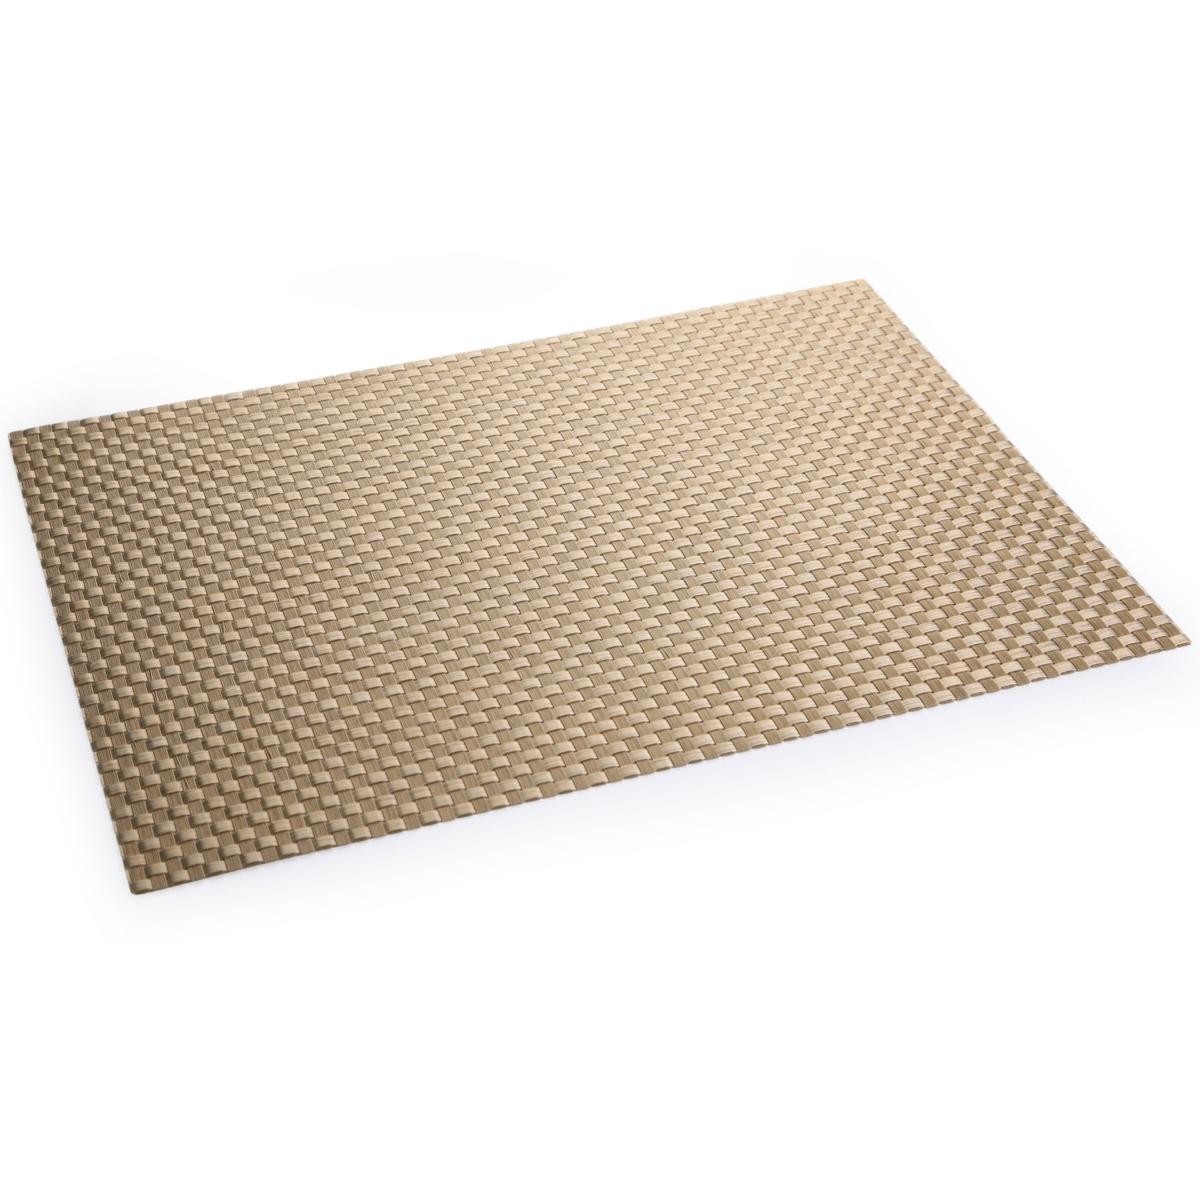 Tescoma prostírání Flair shine zlatá, 45 x 32 cm